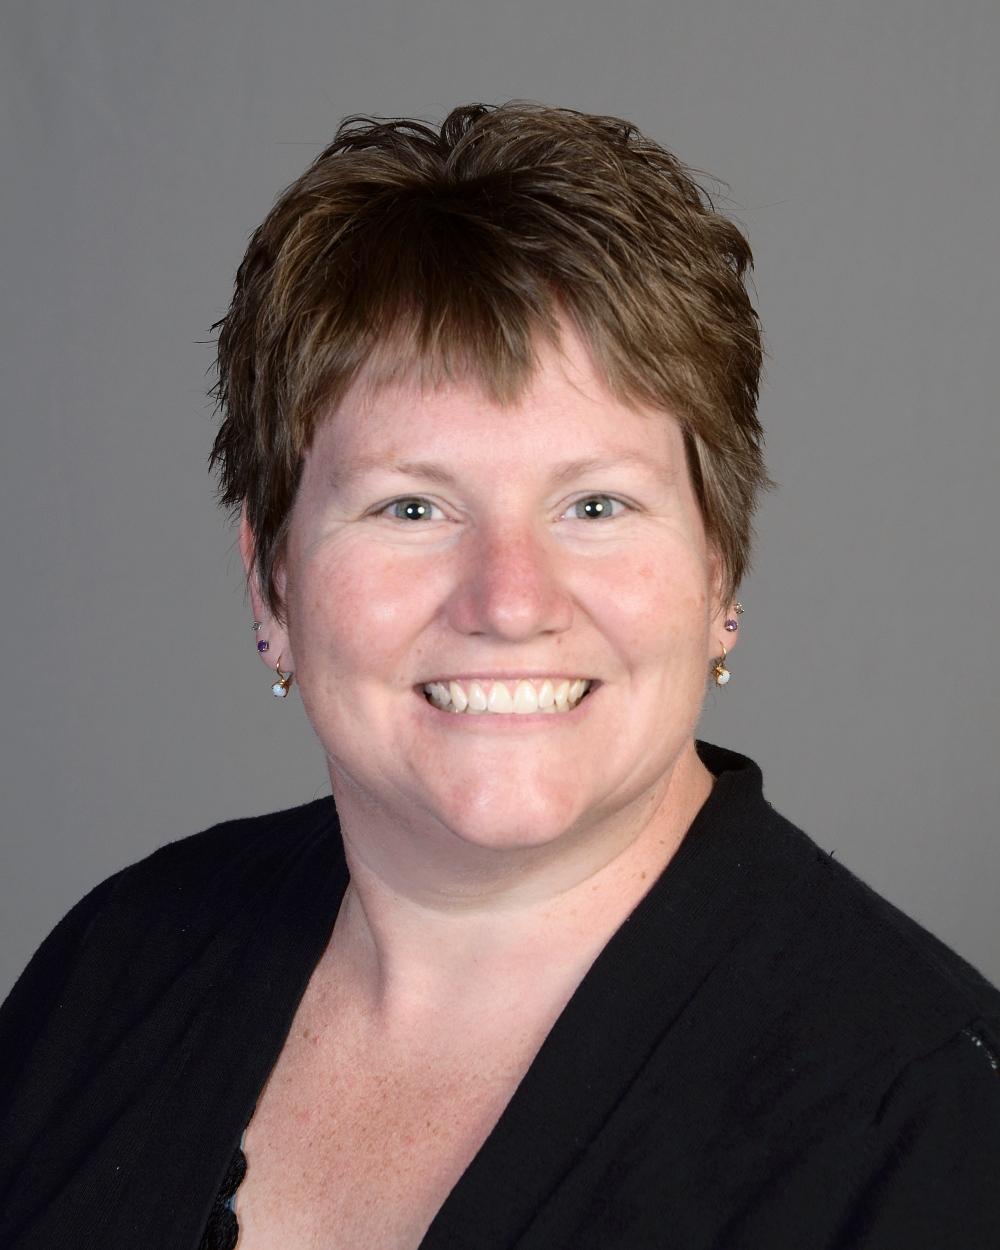 Dean, Southern Conference The Rev. Melissa Waterman ……………………………….. Mt. Calvary, De Soto & First, Murphysboro